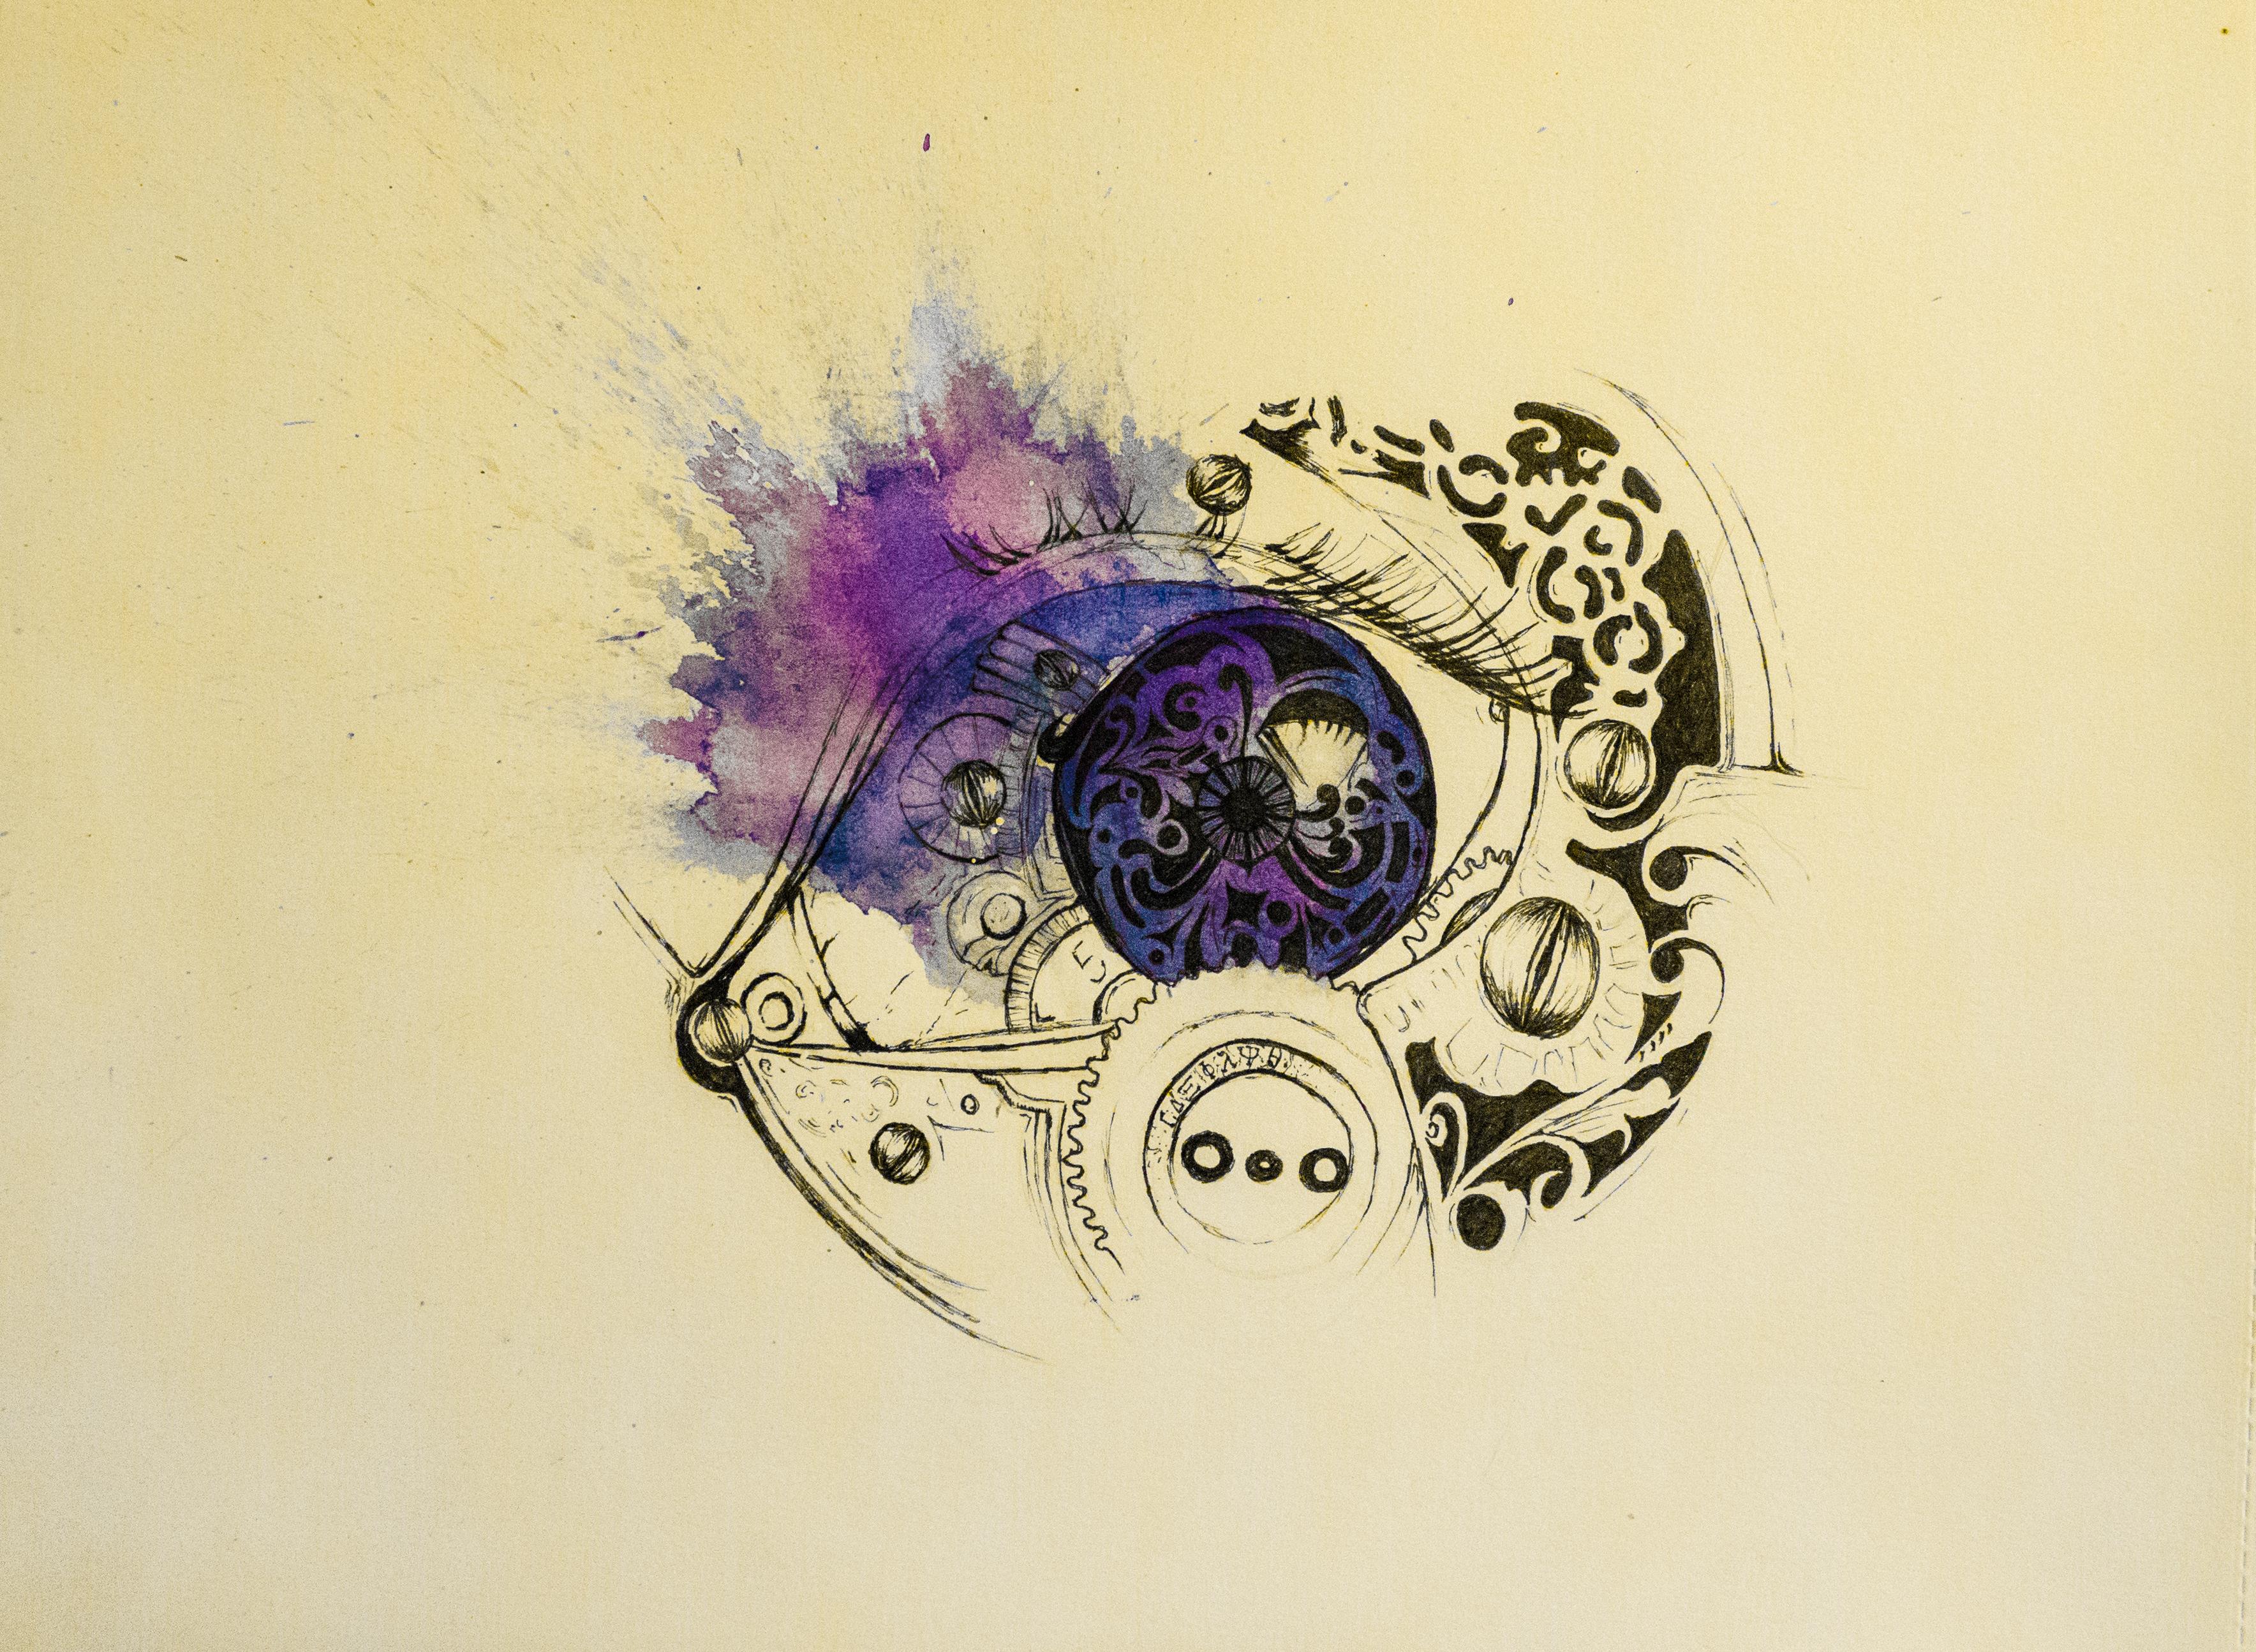 A Mechanical Eye by AlaaAboAbah on DeviantArt